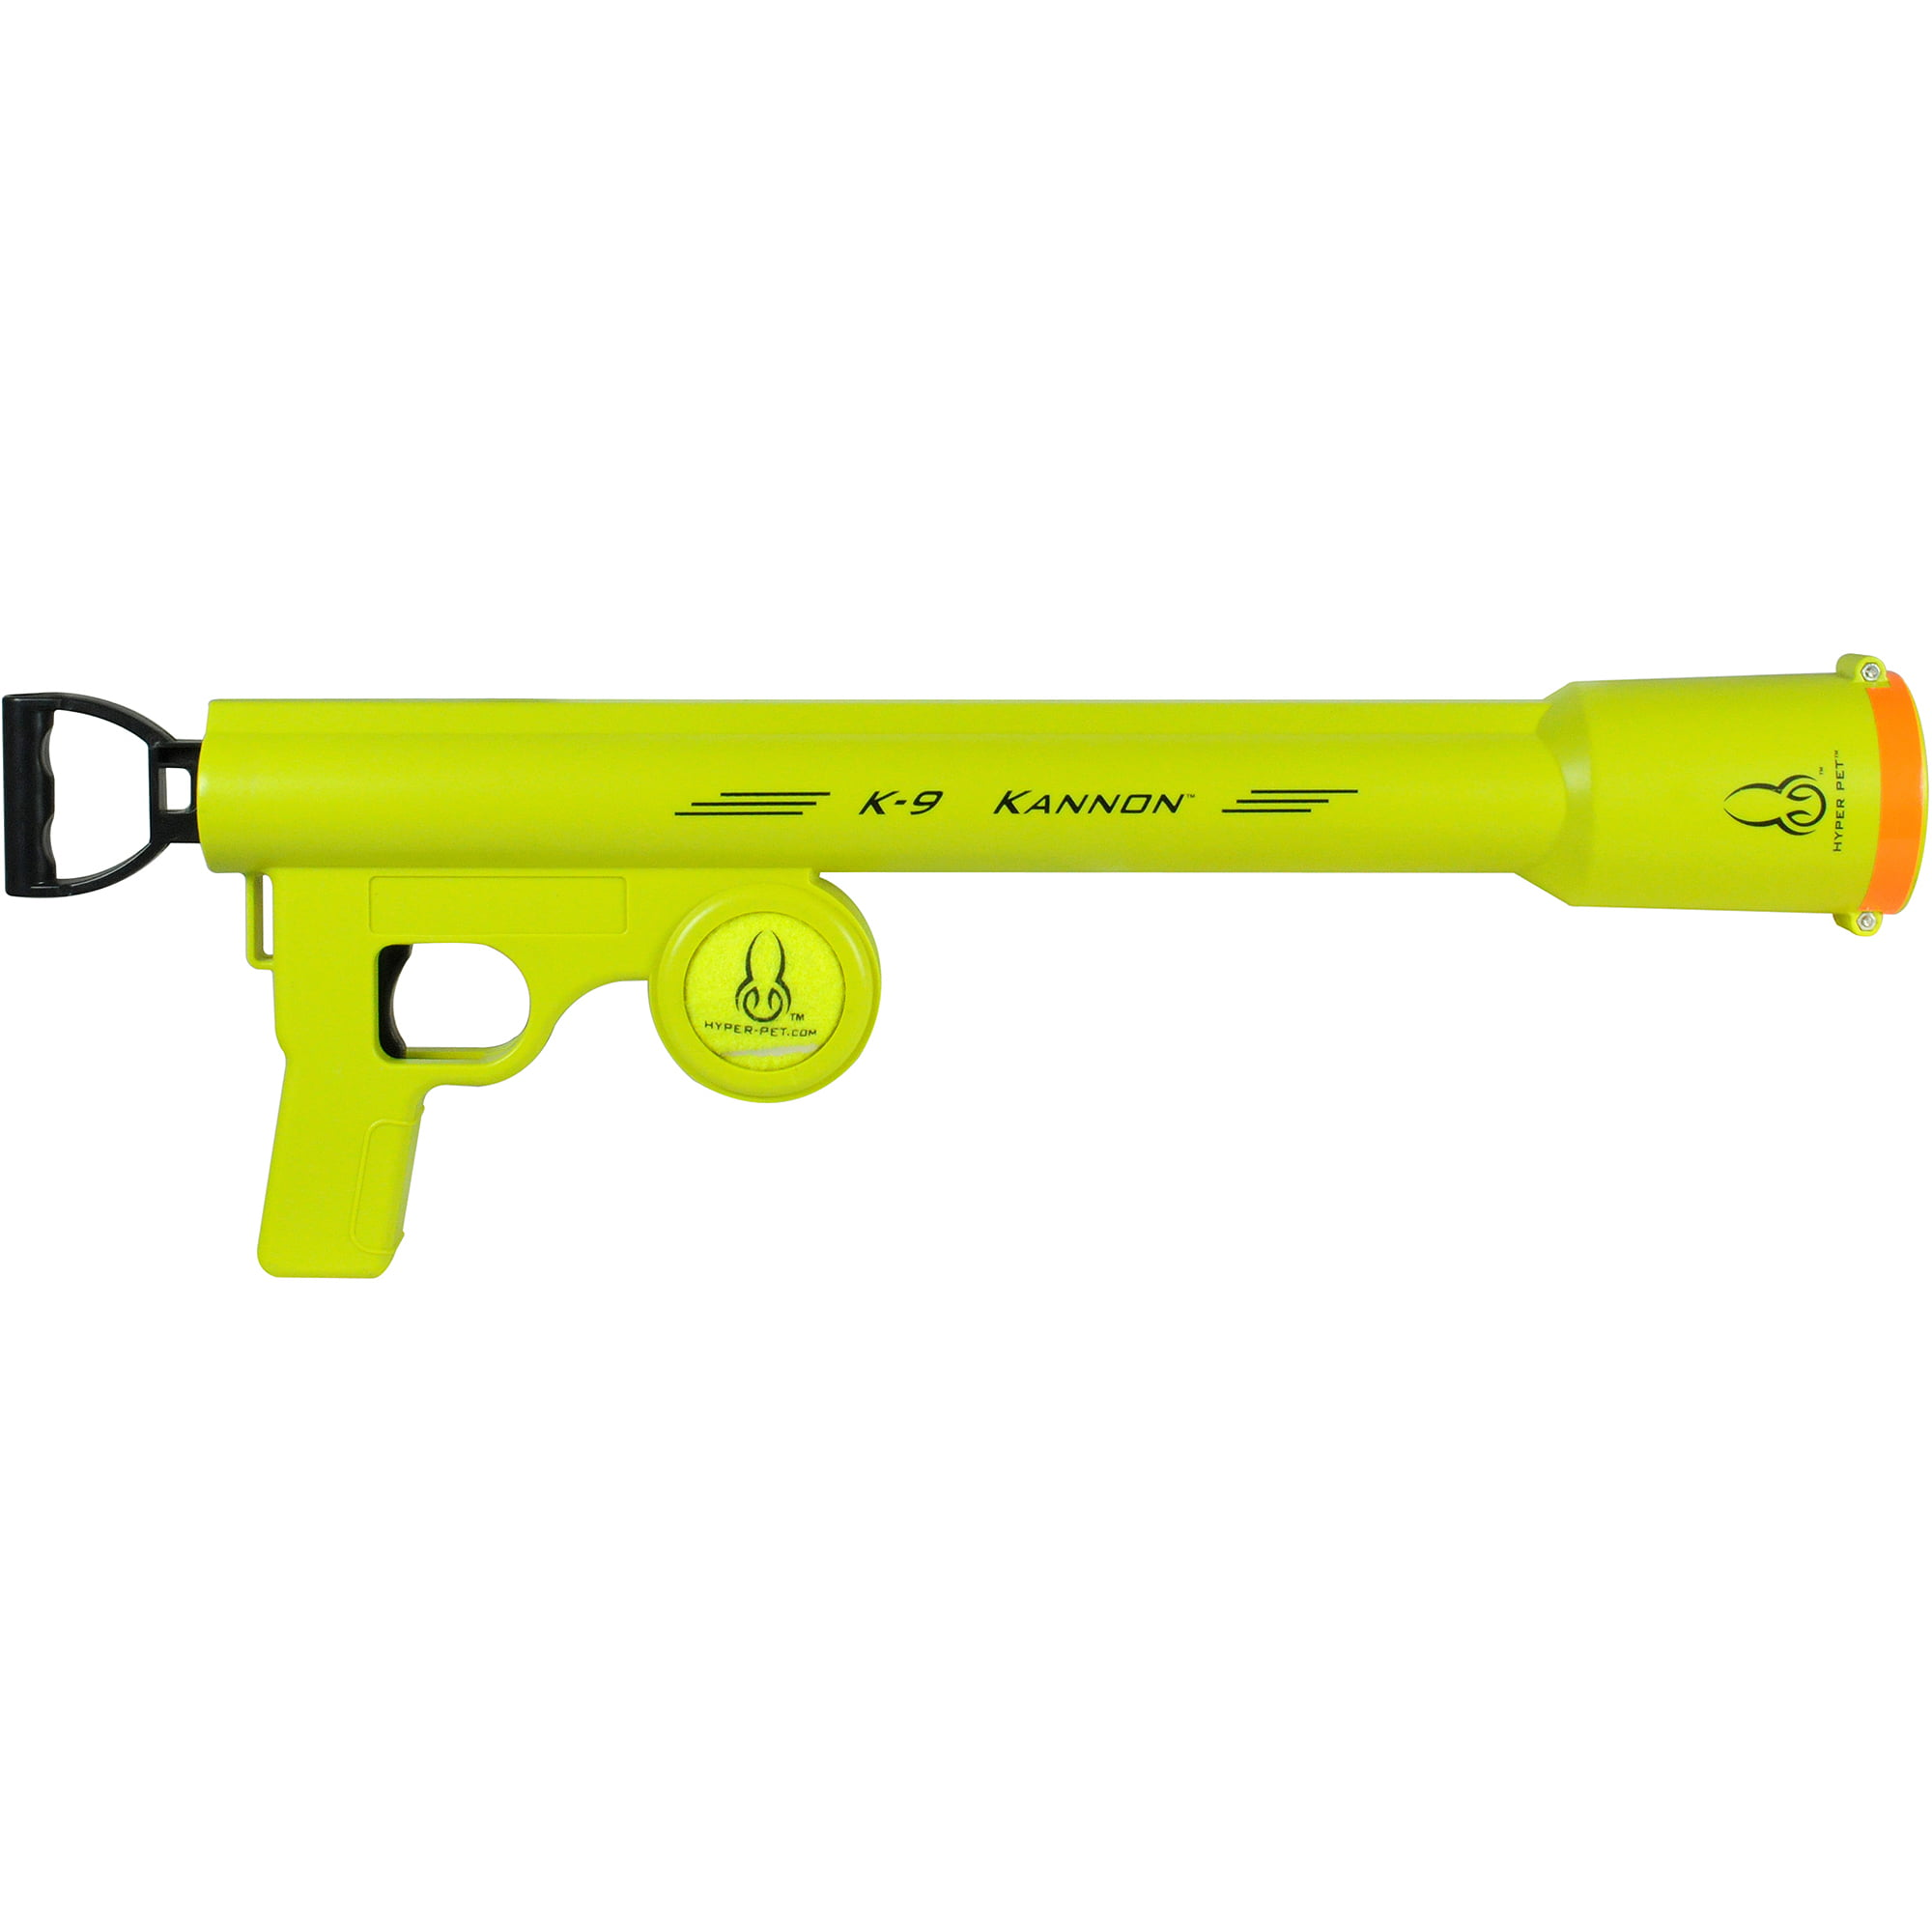 Hyper Pet K-9 Kannon Dog Toy by HYPER PET PRODUCTS